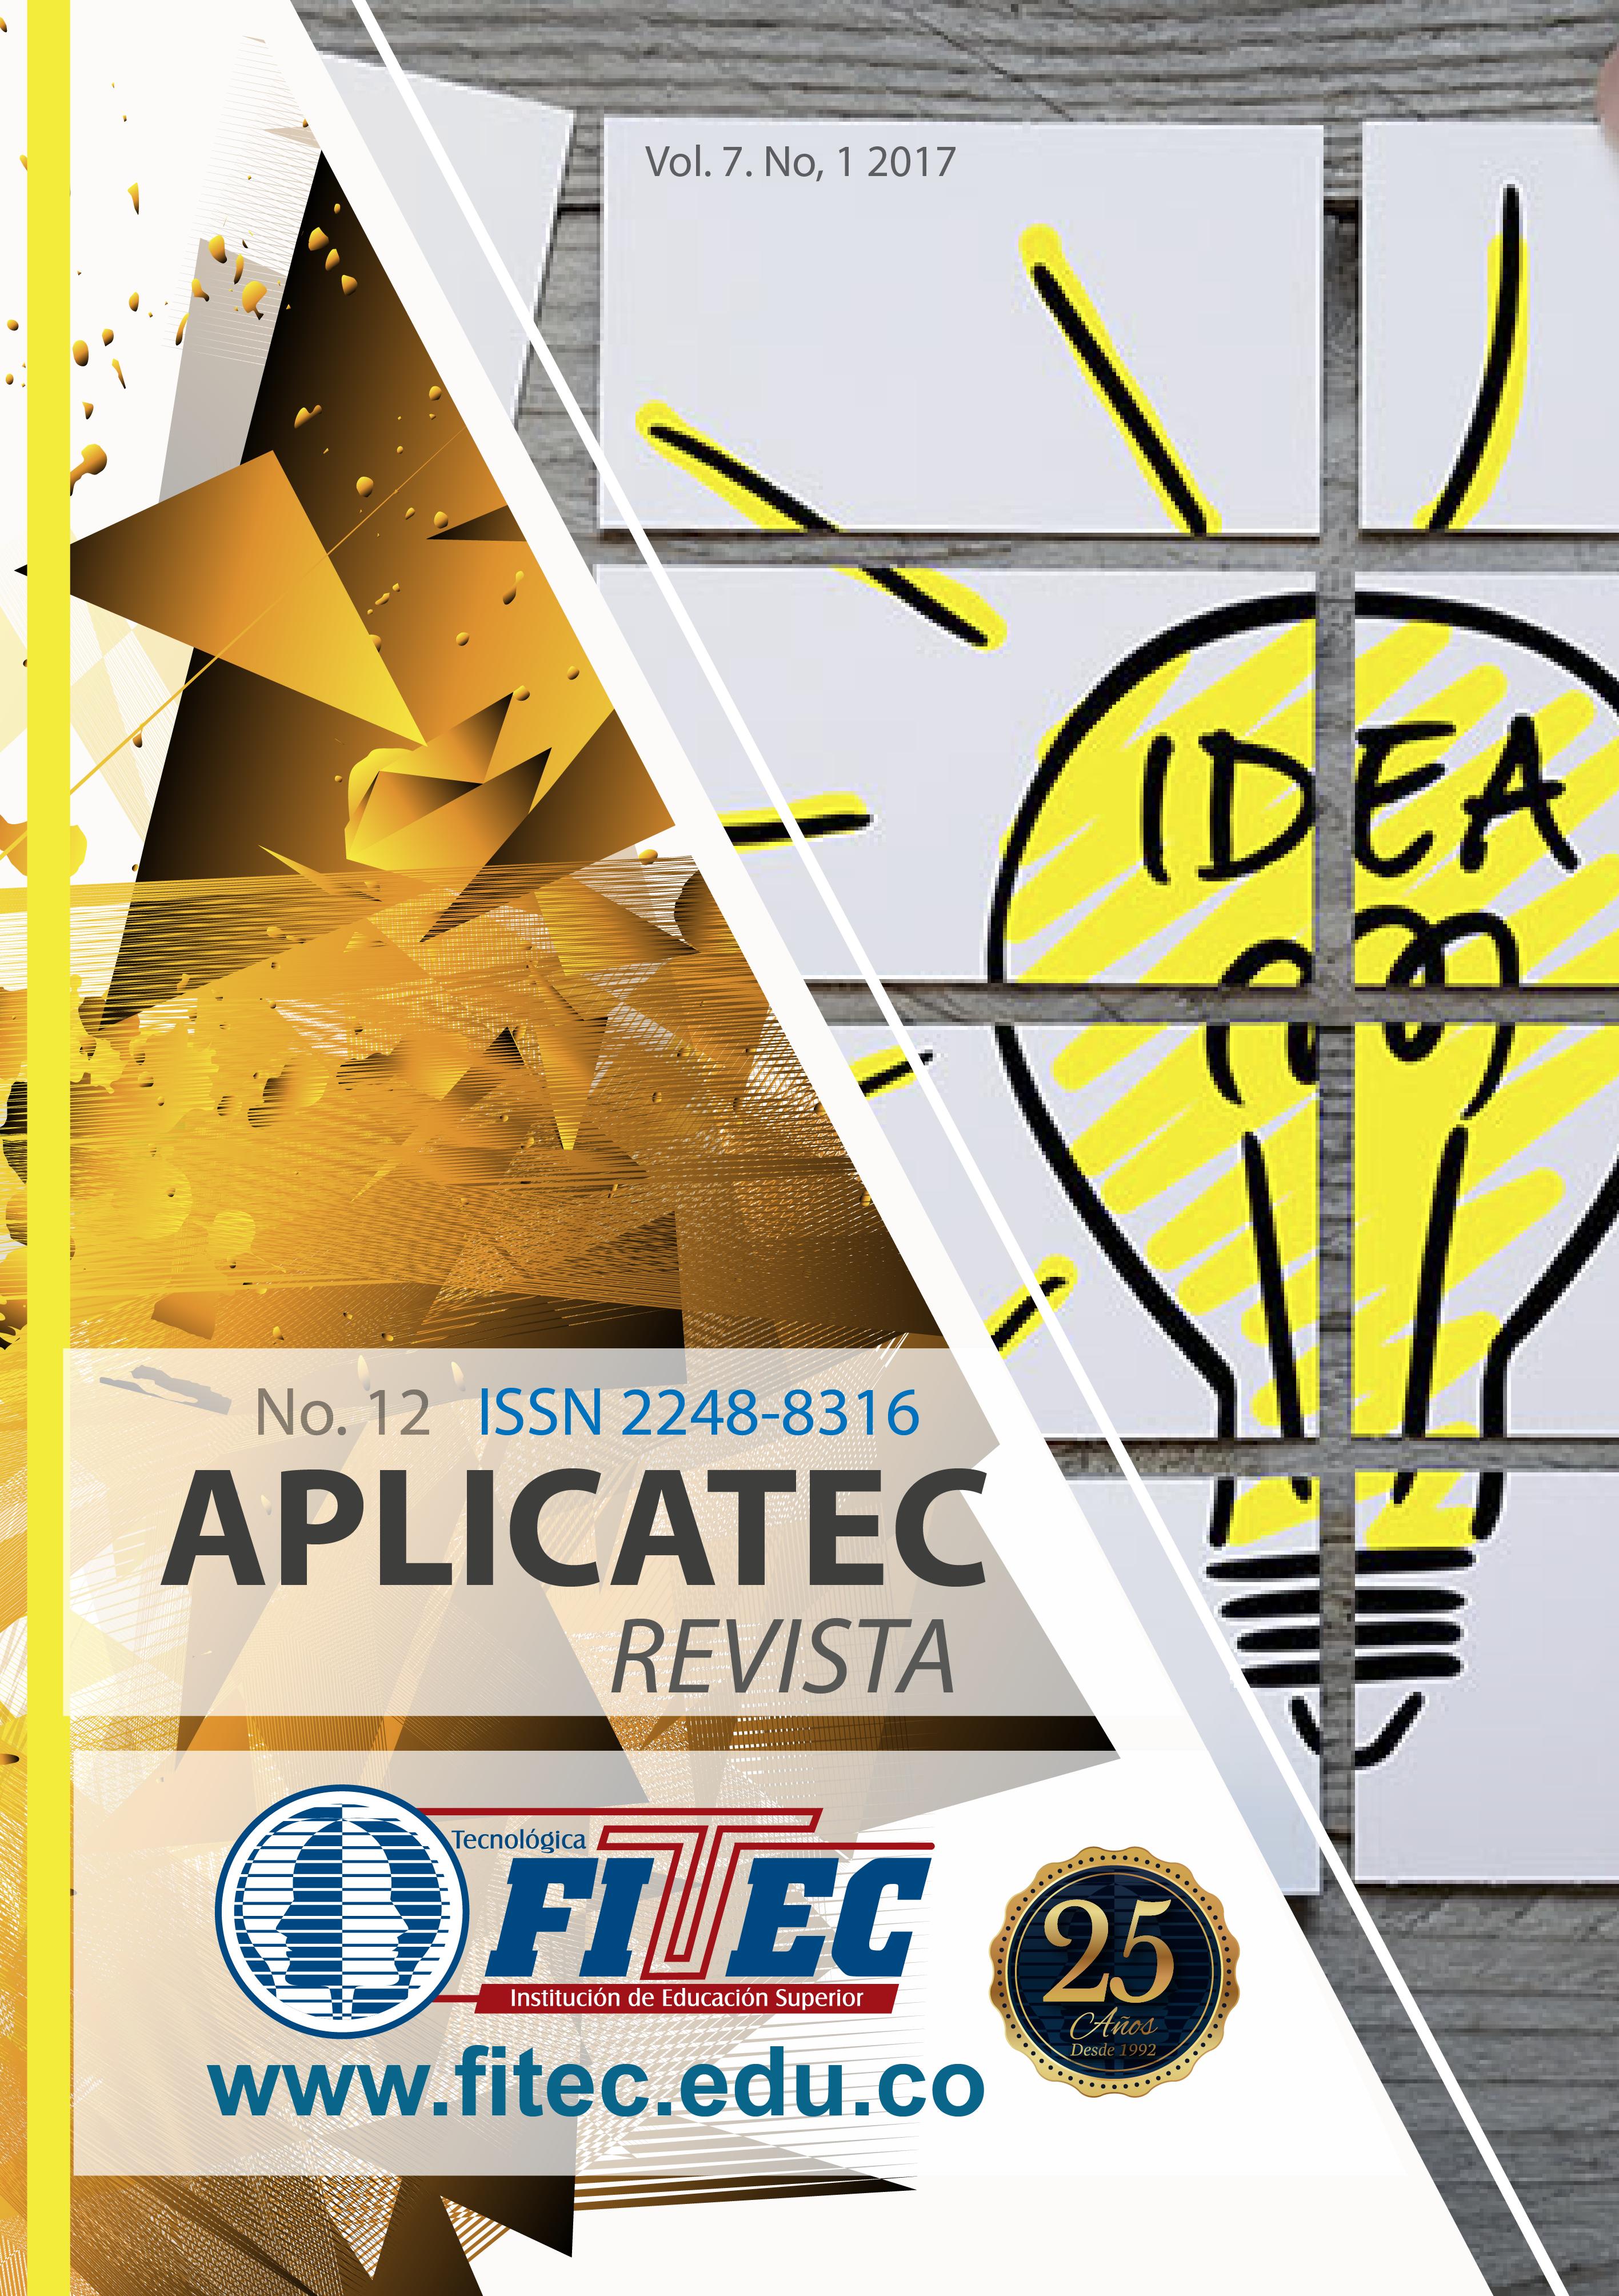 Aplicatec Volumen 7 No. 1 2017